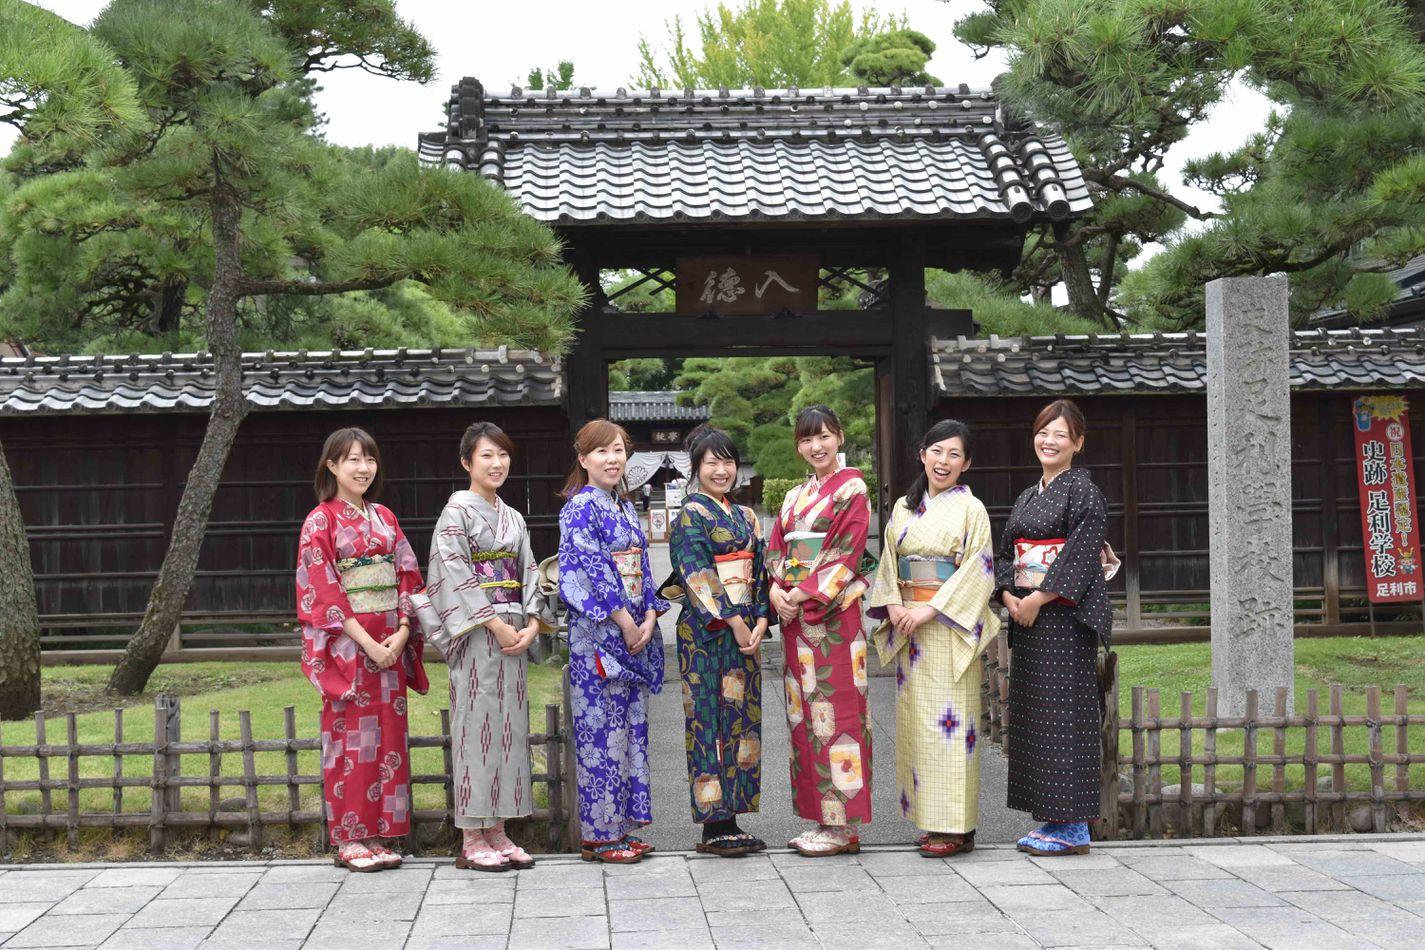 Experience wearing a kimono